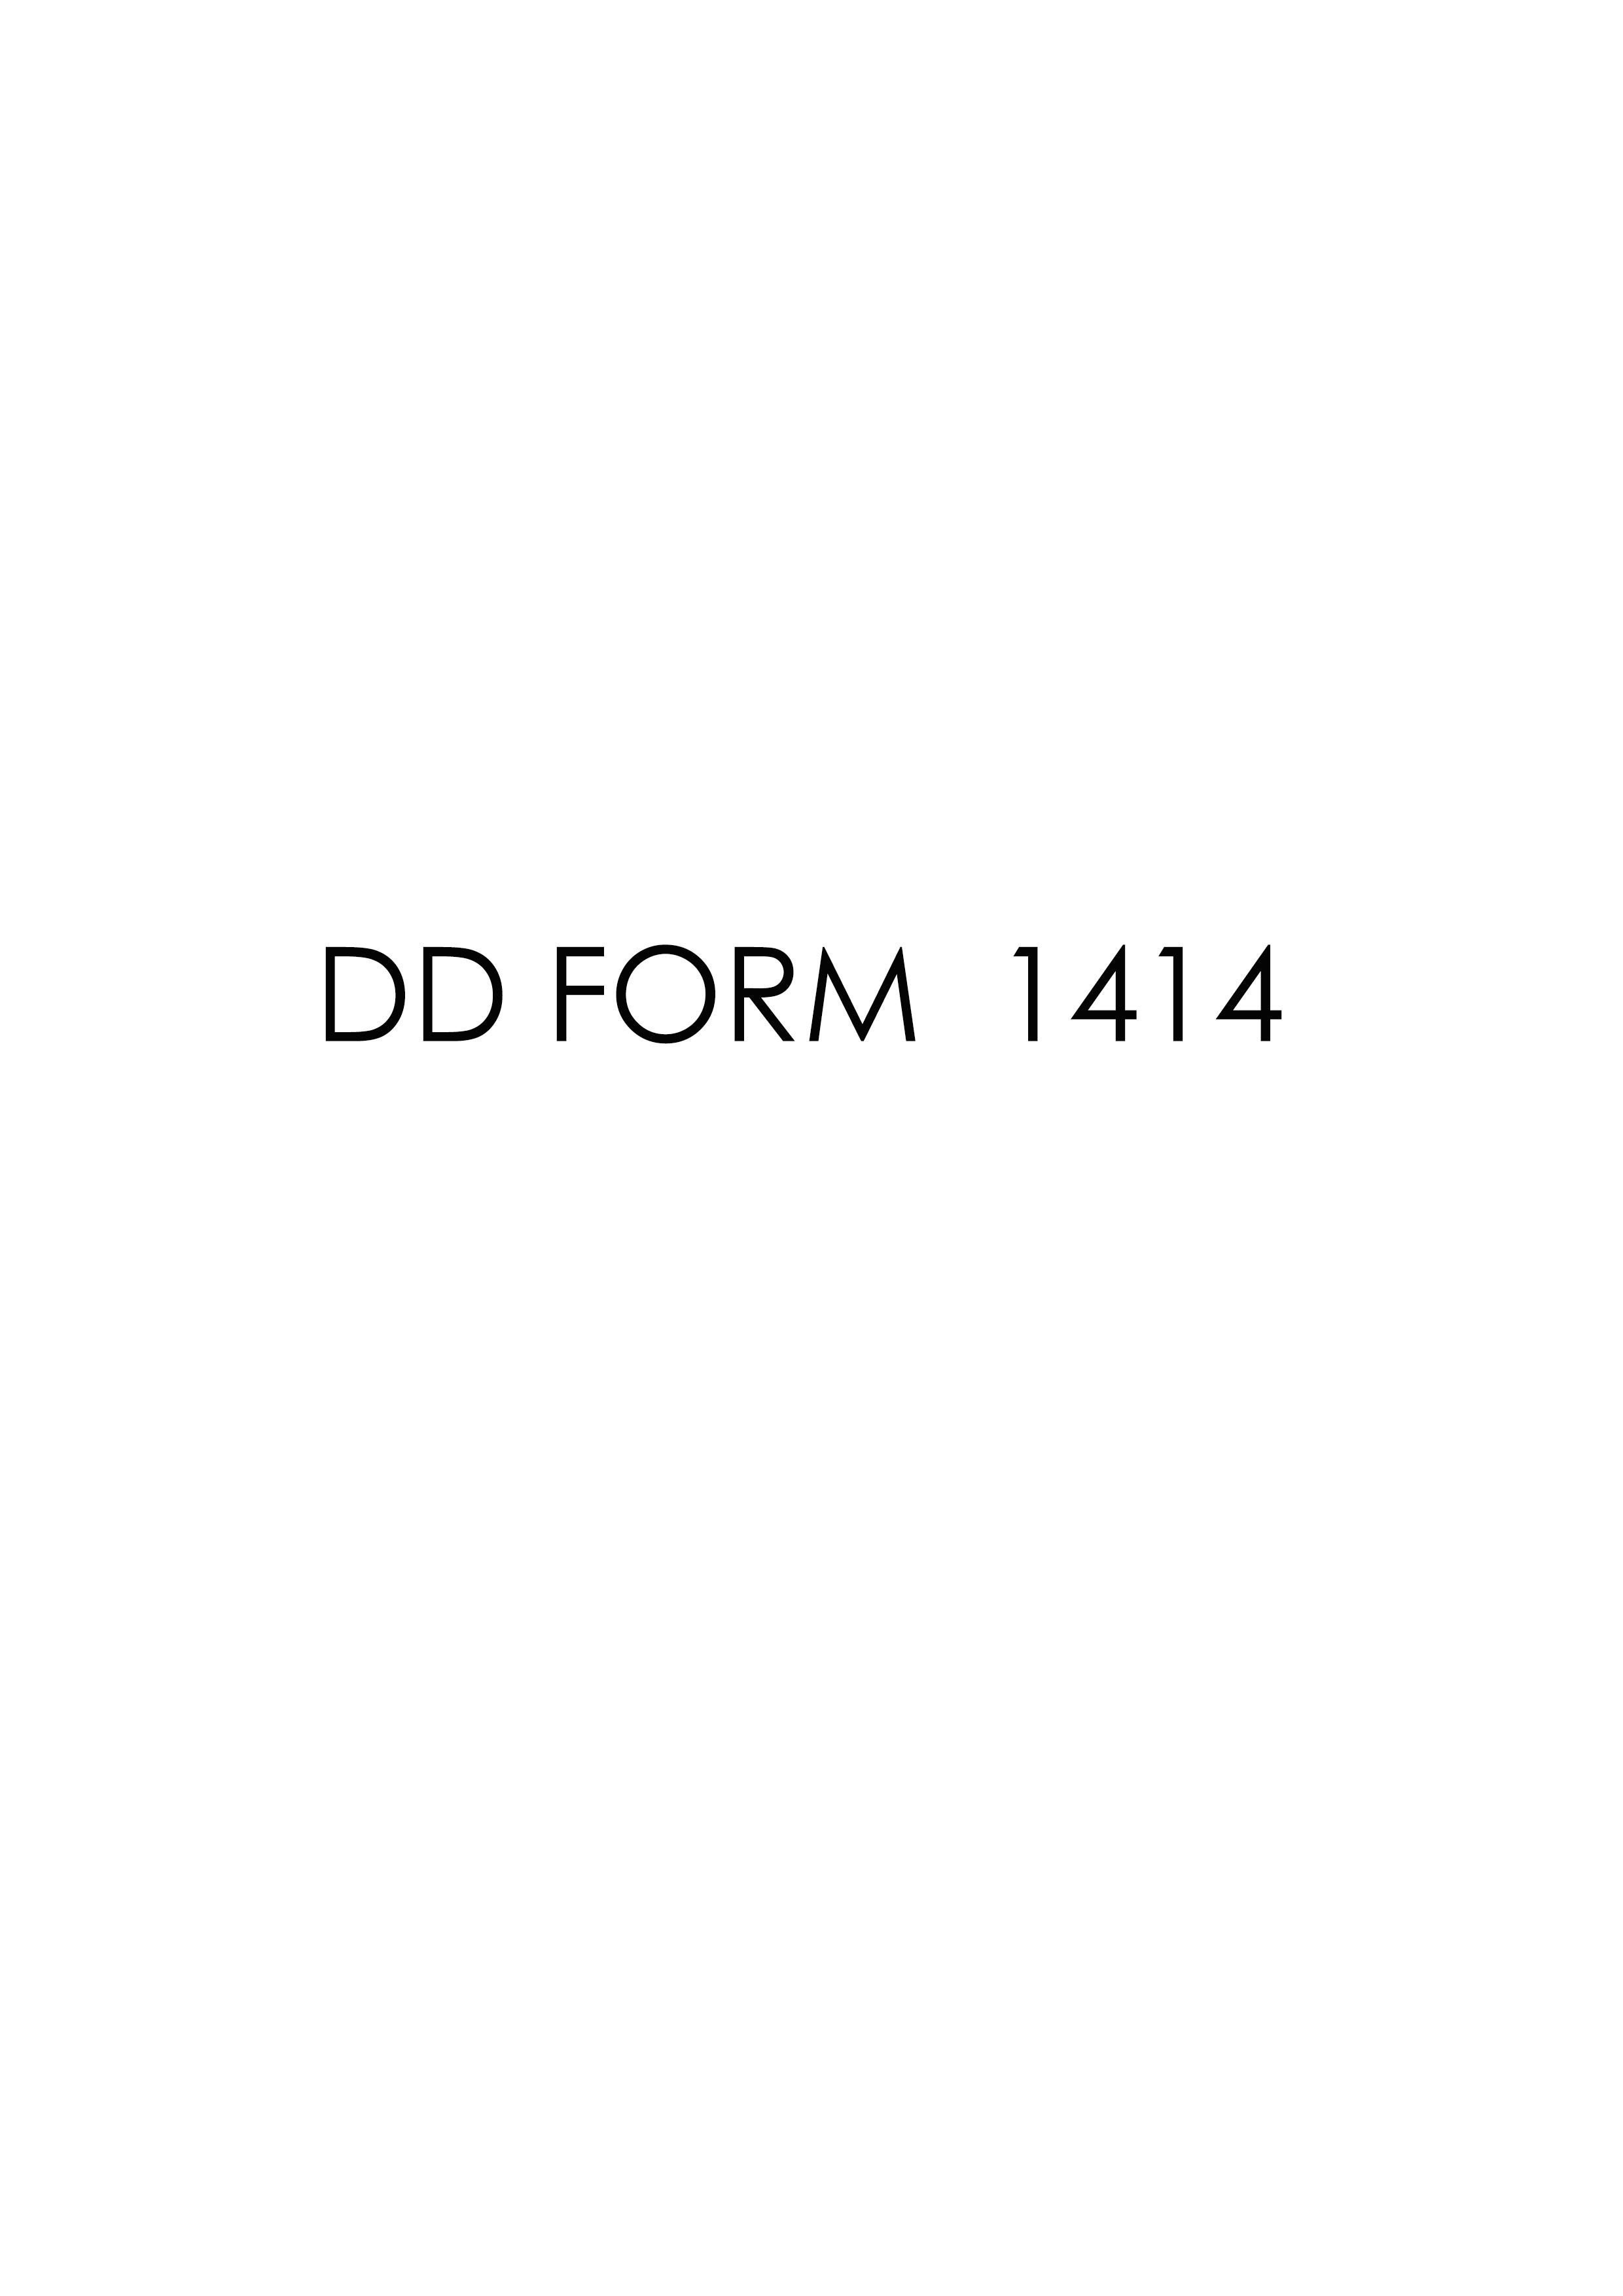 Download dd Form 1414 Free